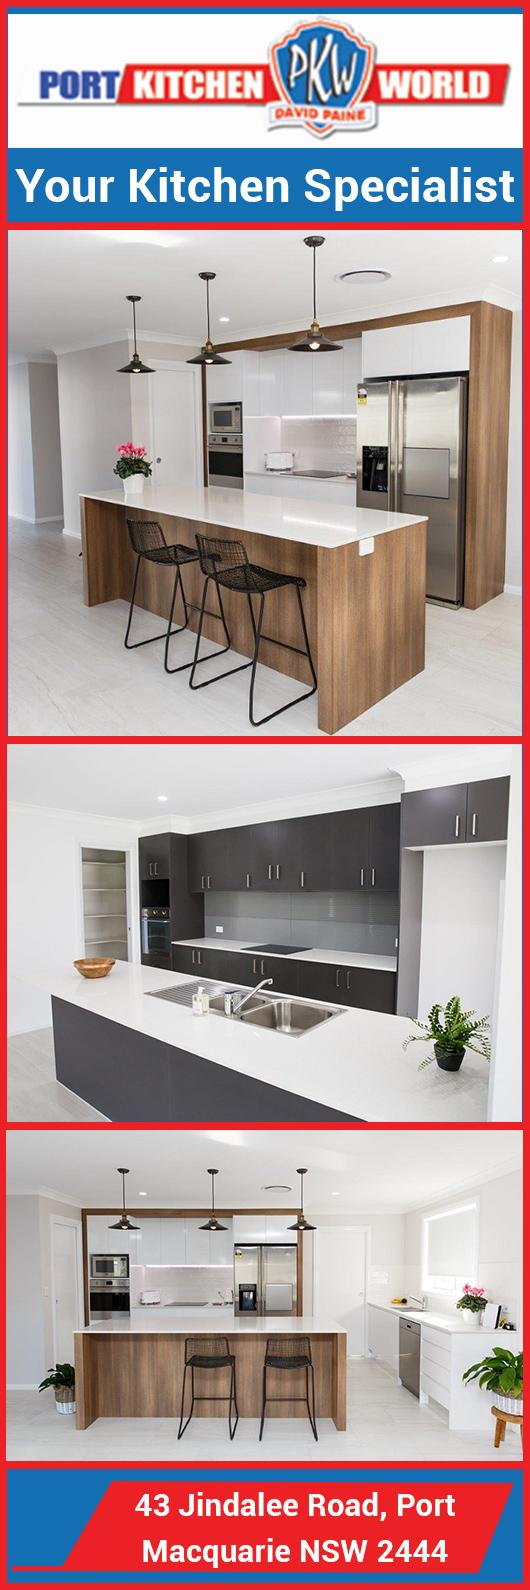 Port Kitchen World - Kitchen Renovations & Designs - 43 Jindalee Rd